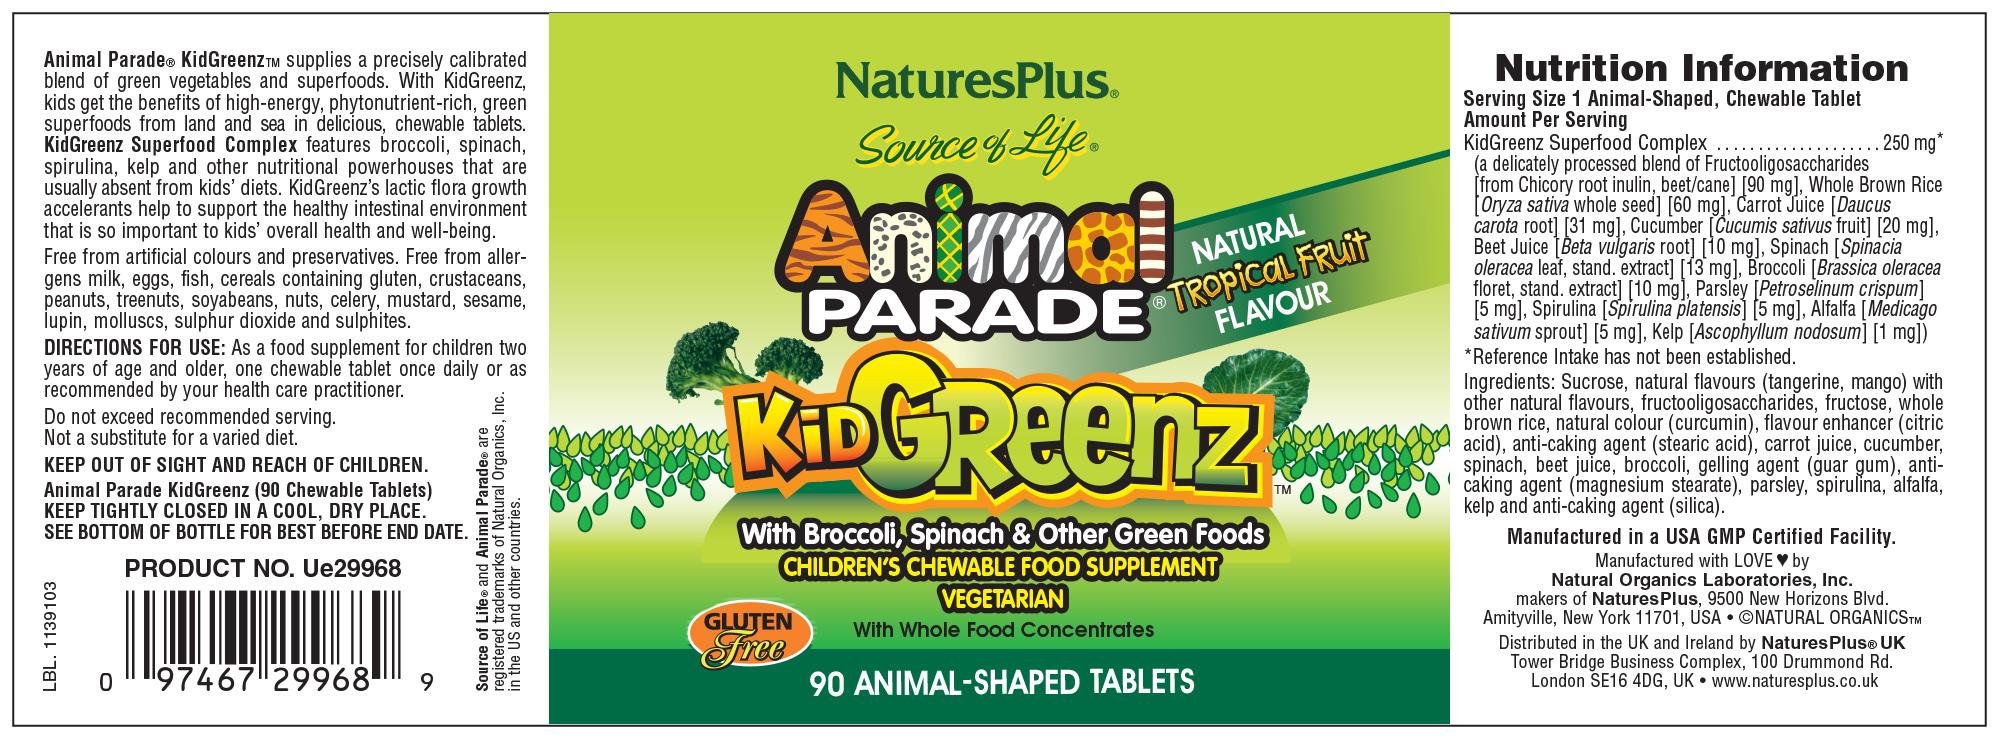 Source of Life Animal Parade KidGreenz Natural Tropical Fruit Flavour 90's